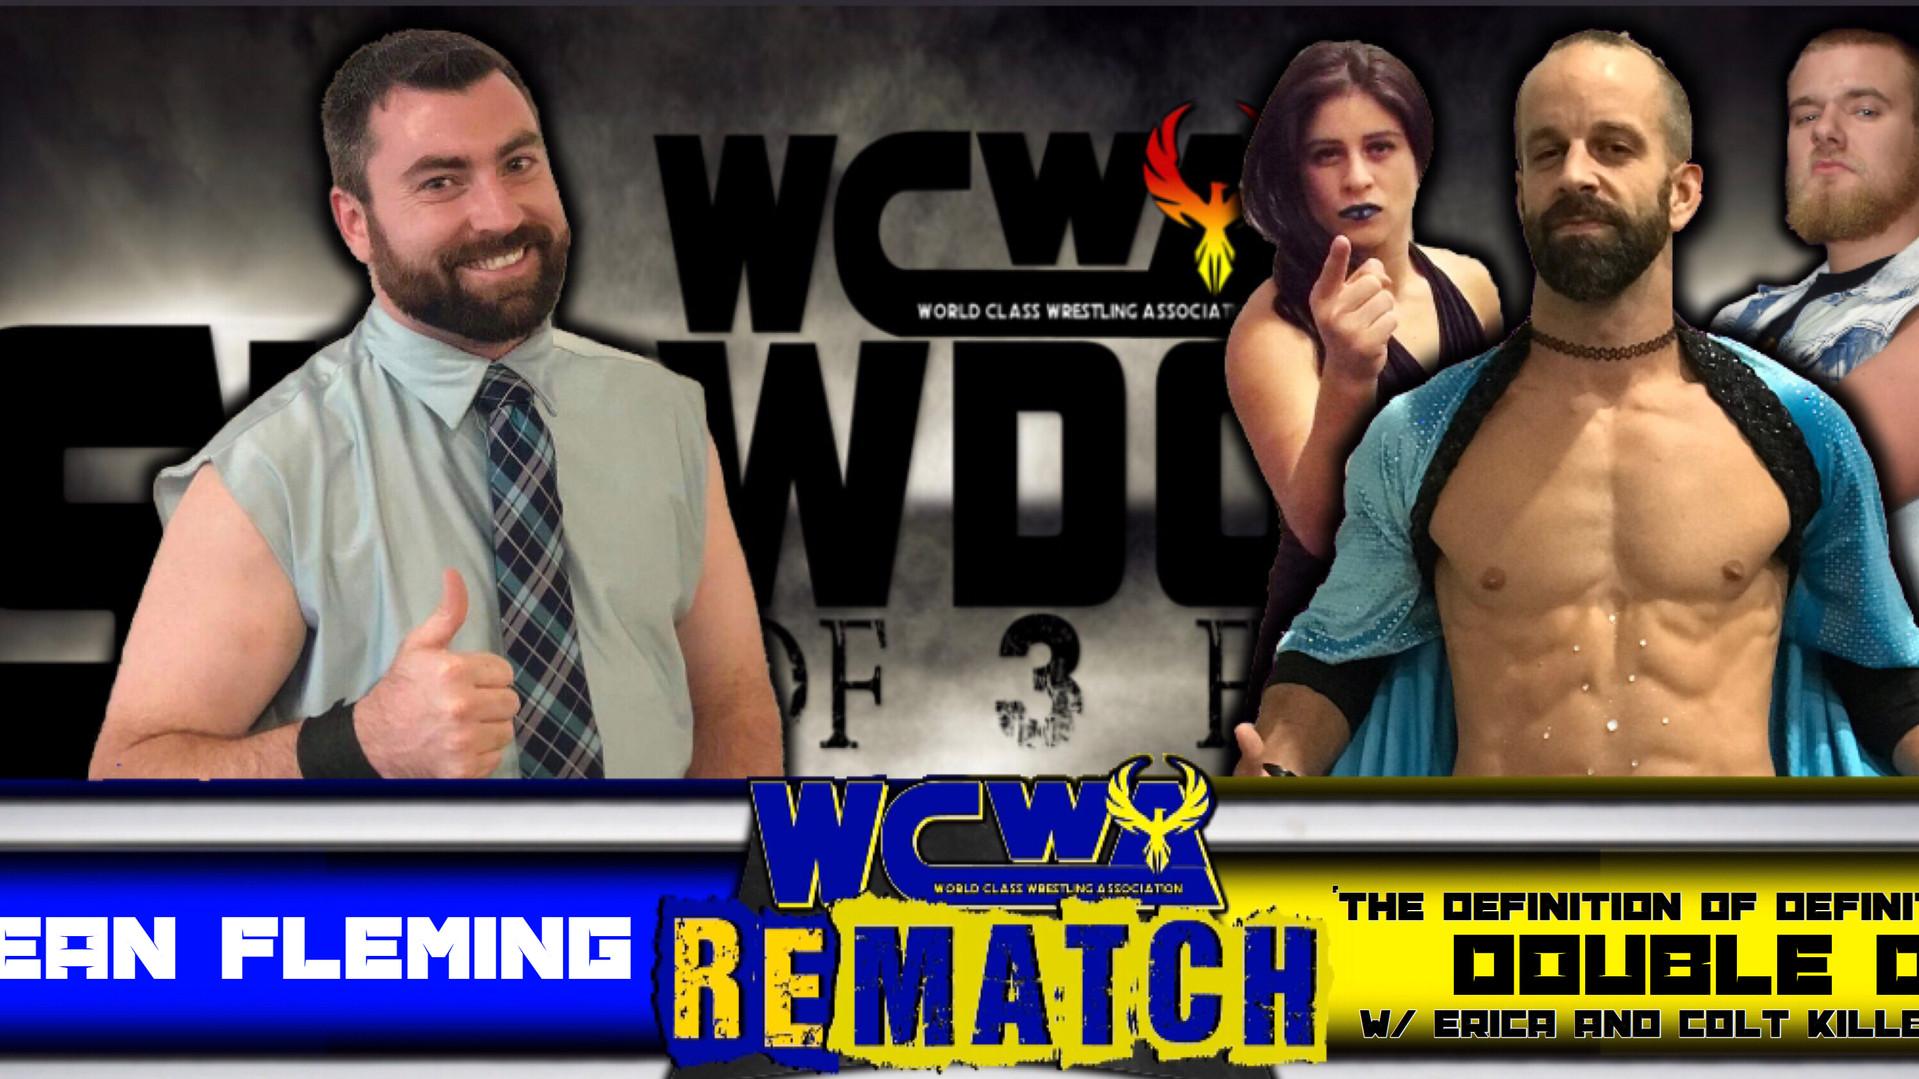 Dean Fleming vs Double D w/ Erica Torres & Colt Killbane